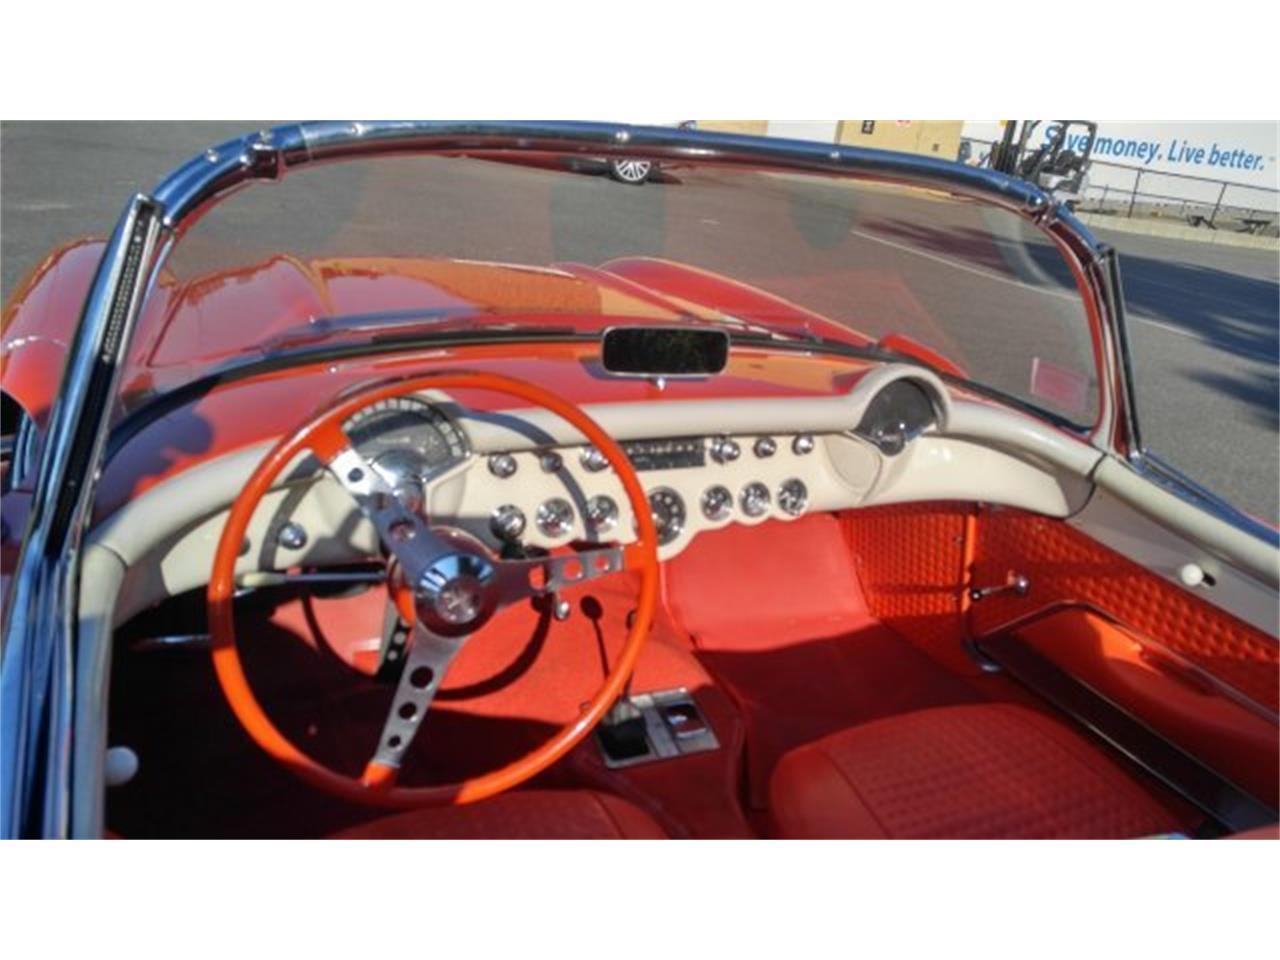 Large Picture of Classic 1956 Chevrolet Corvette located in Hanover Massachusetts - $59,500.00 - K3QK